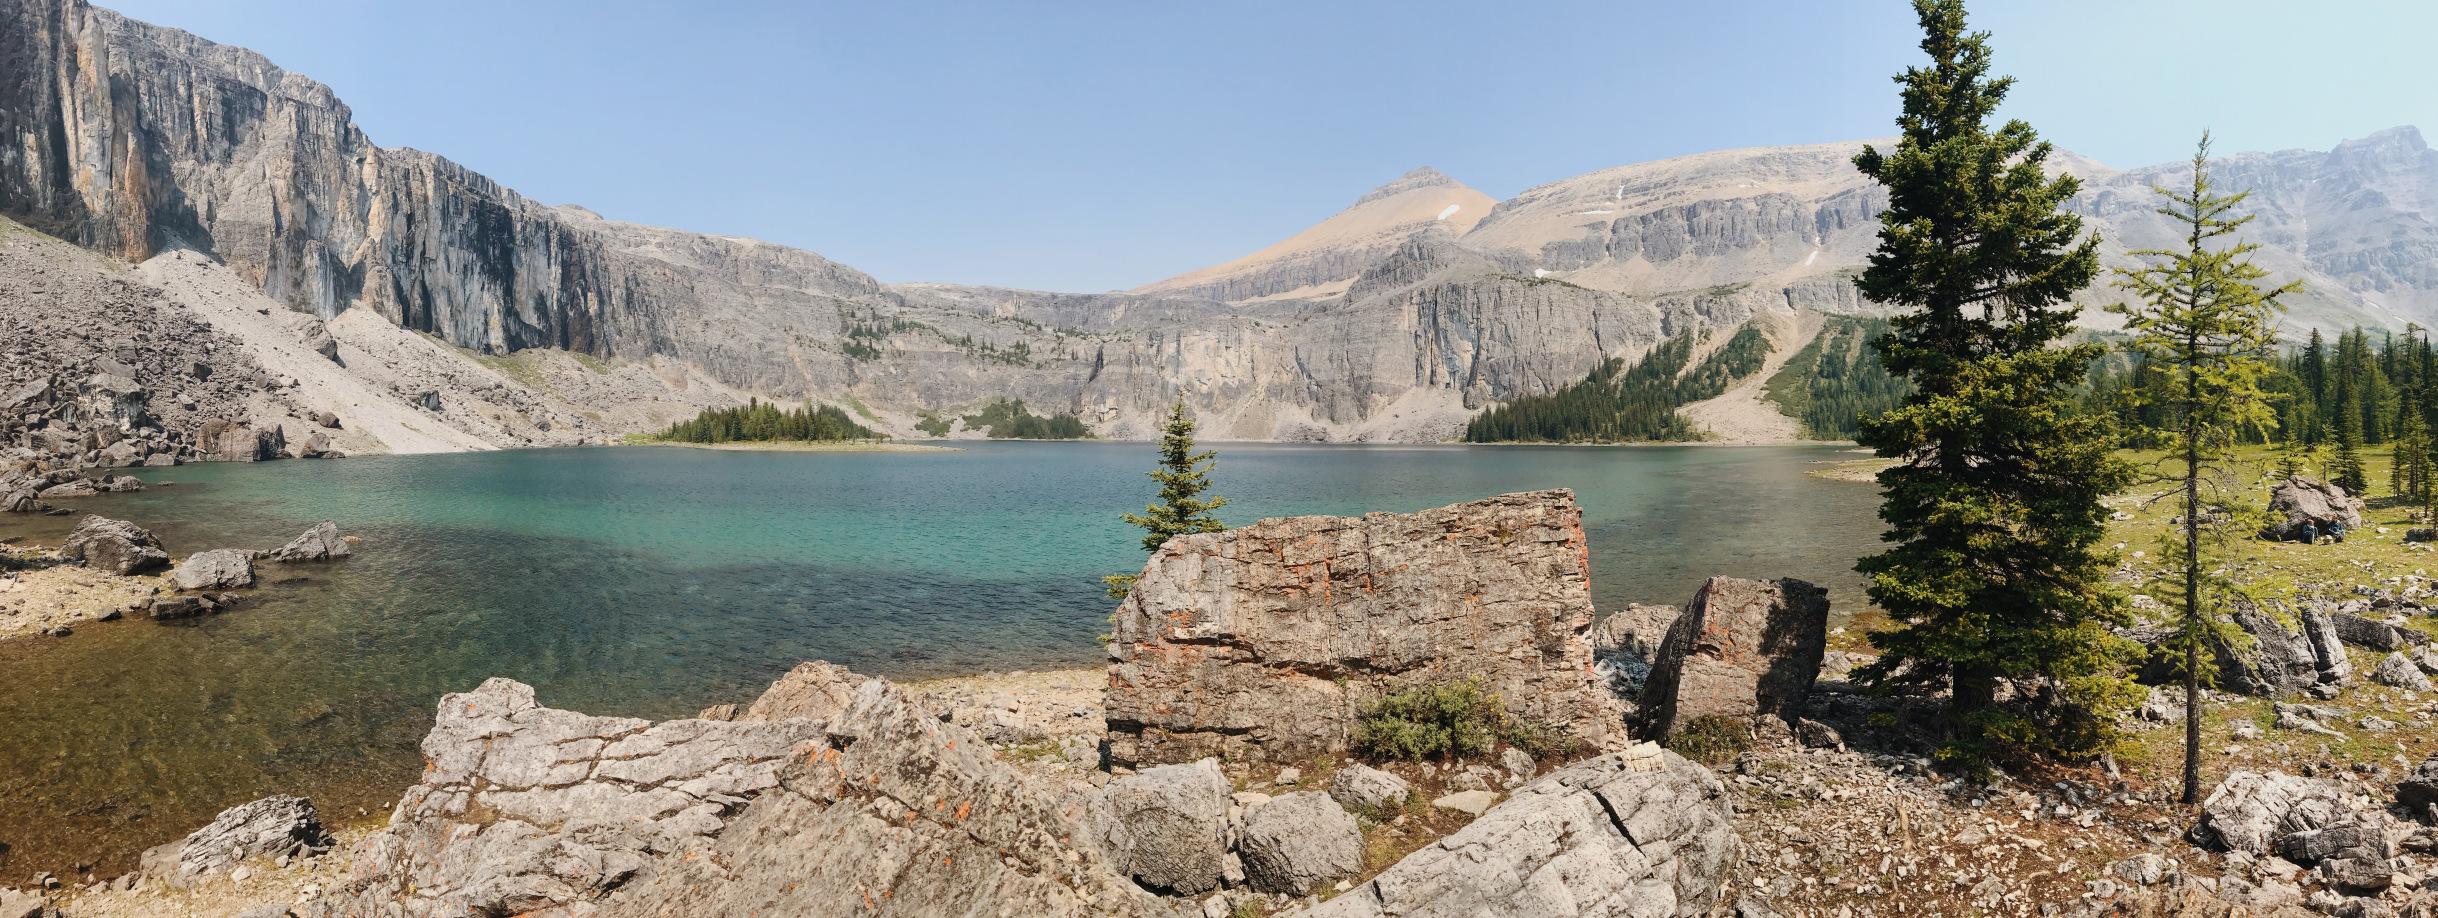 A panoramic view of Rockbound Lake